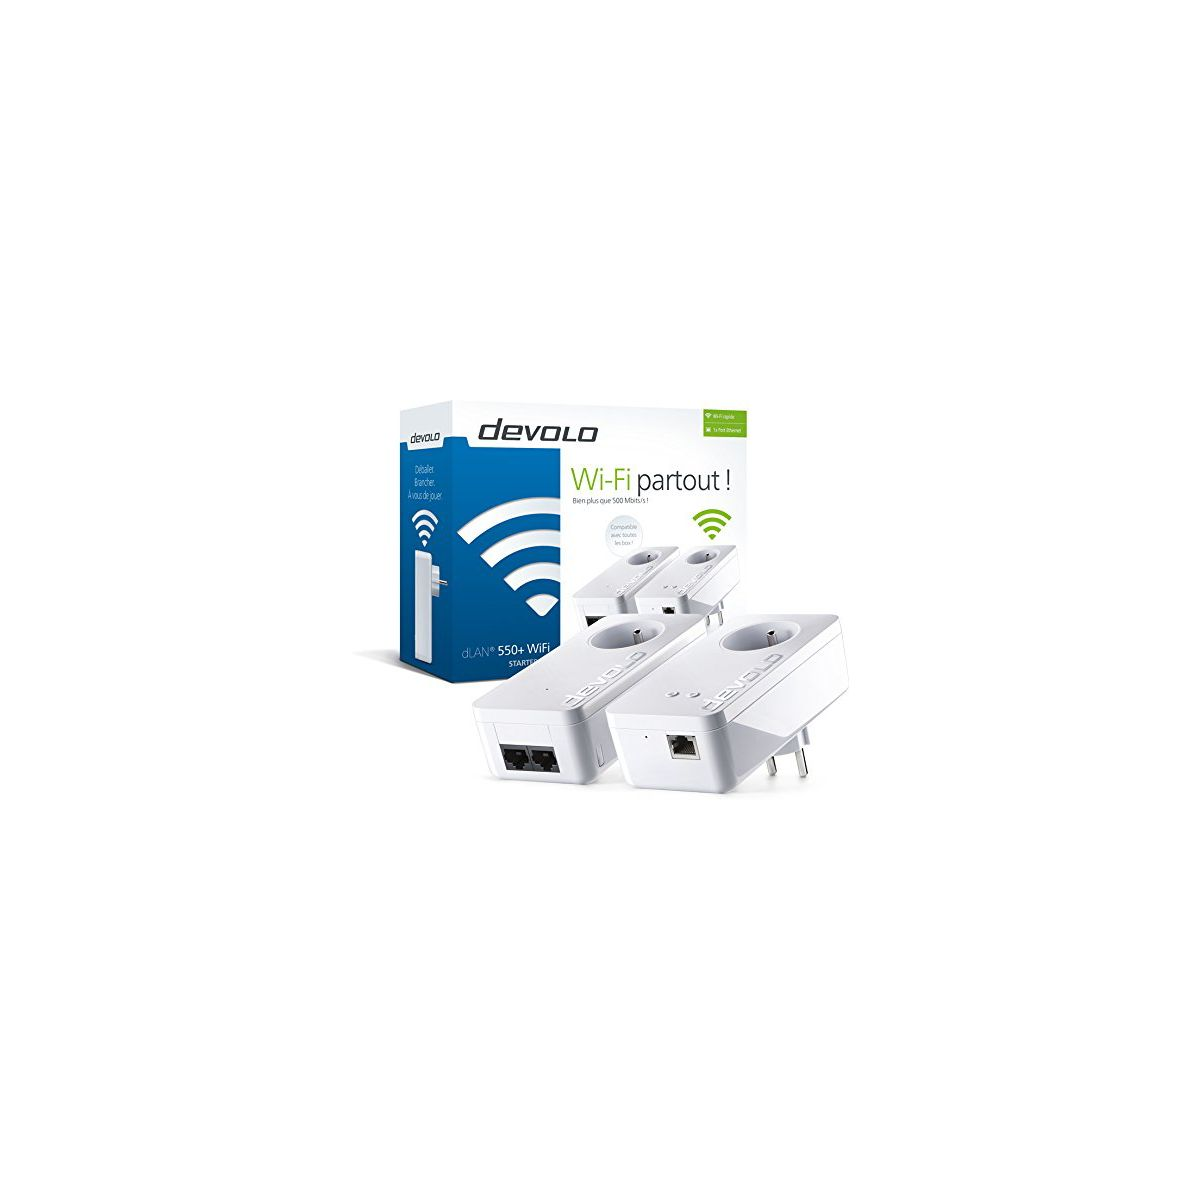 CPL DEVOLO dLAN 550+ - Starter Kit avec prise